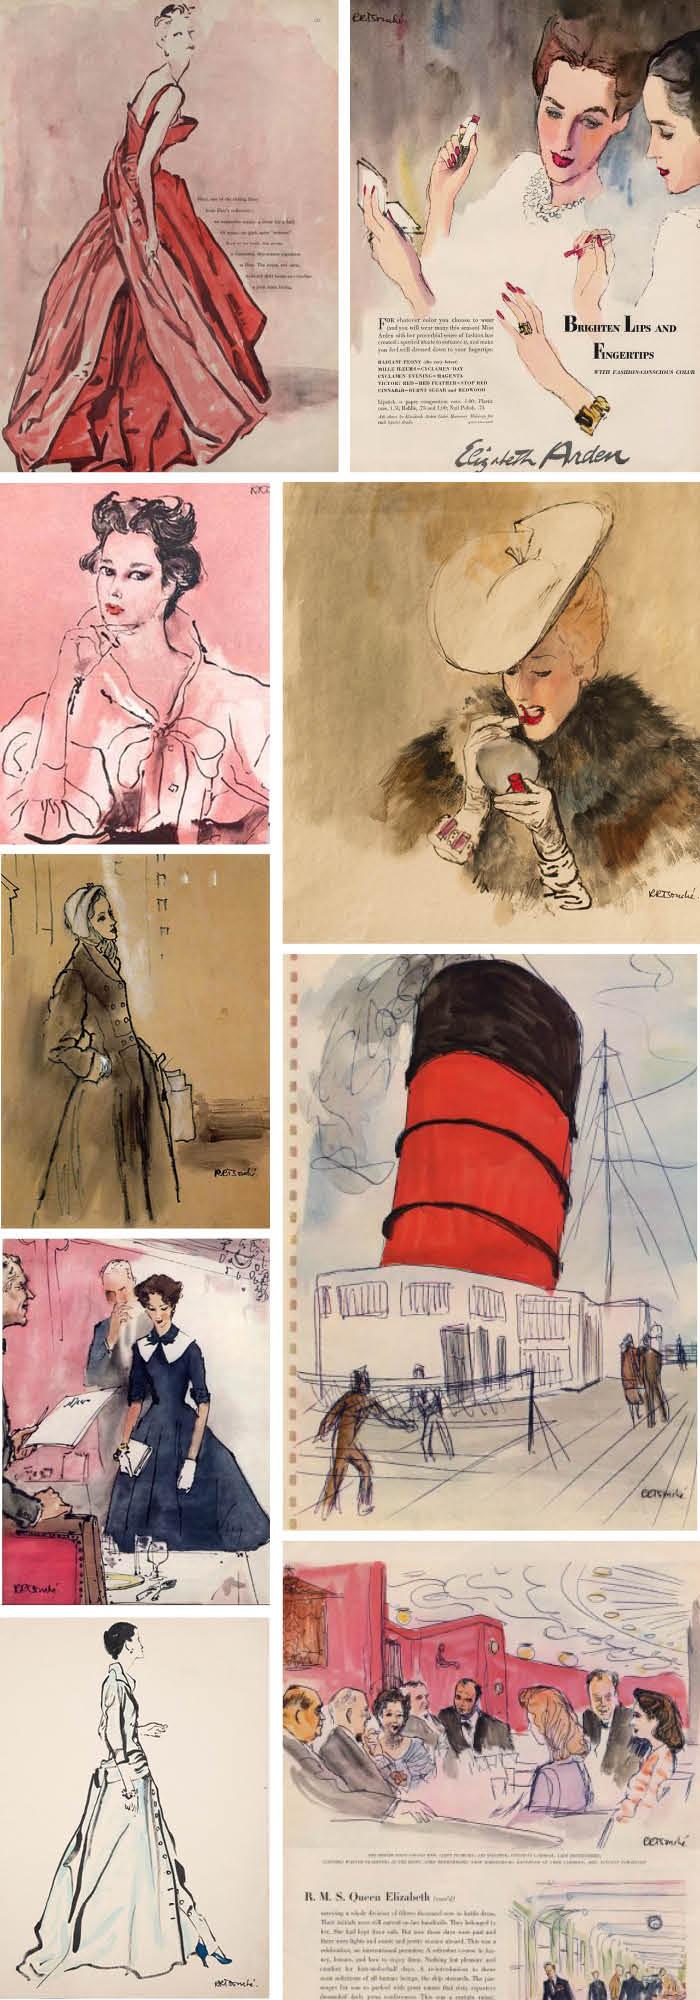 René Robert Bouché fashion illustrations